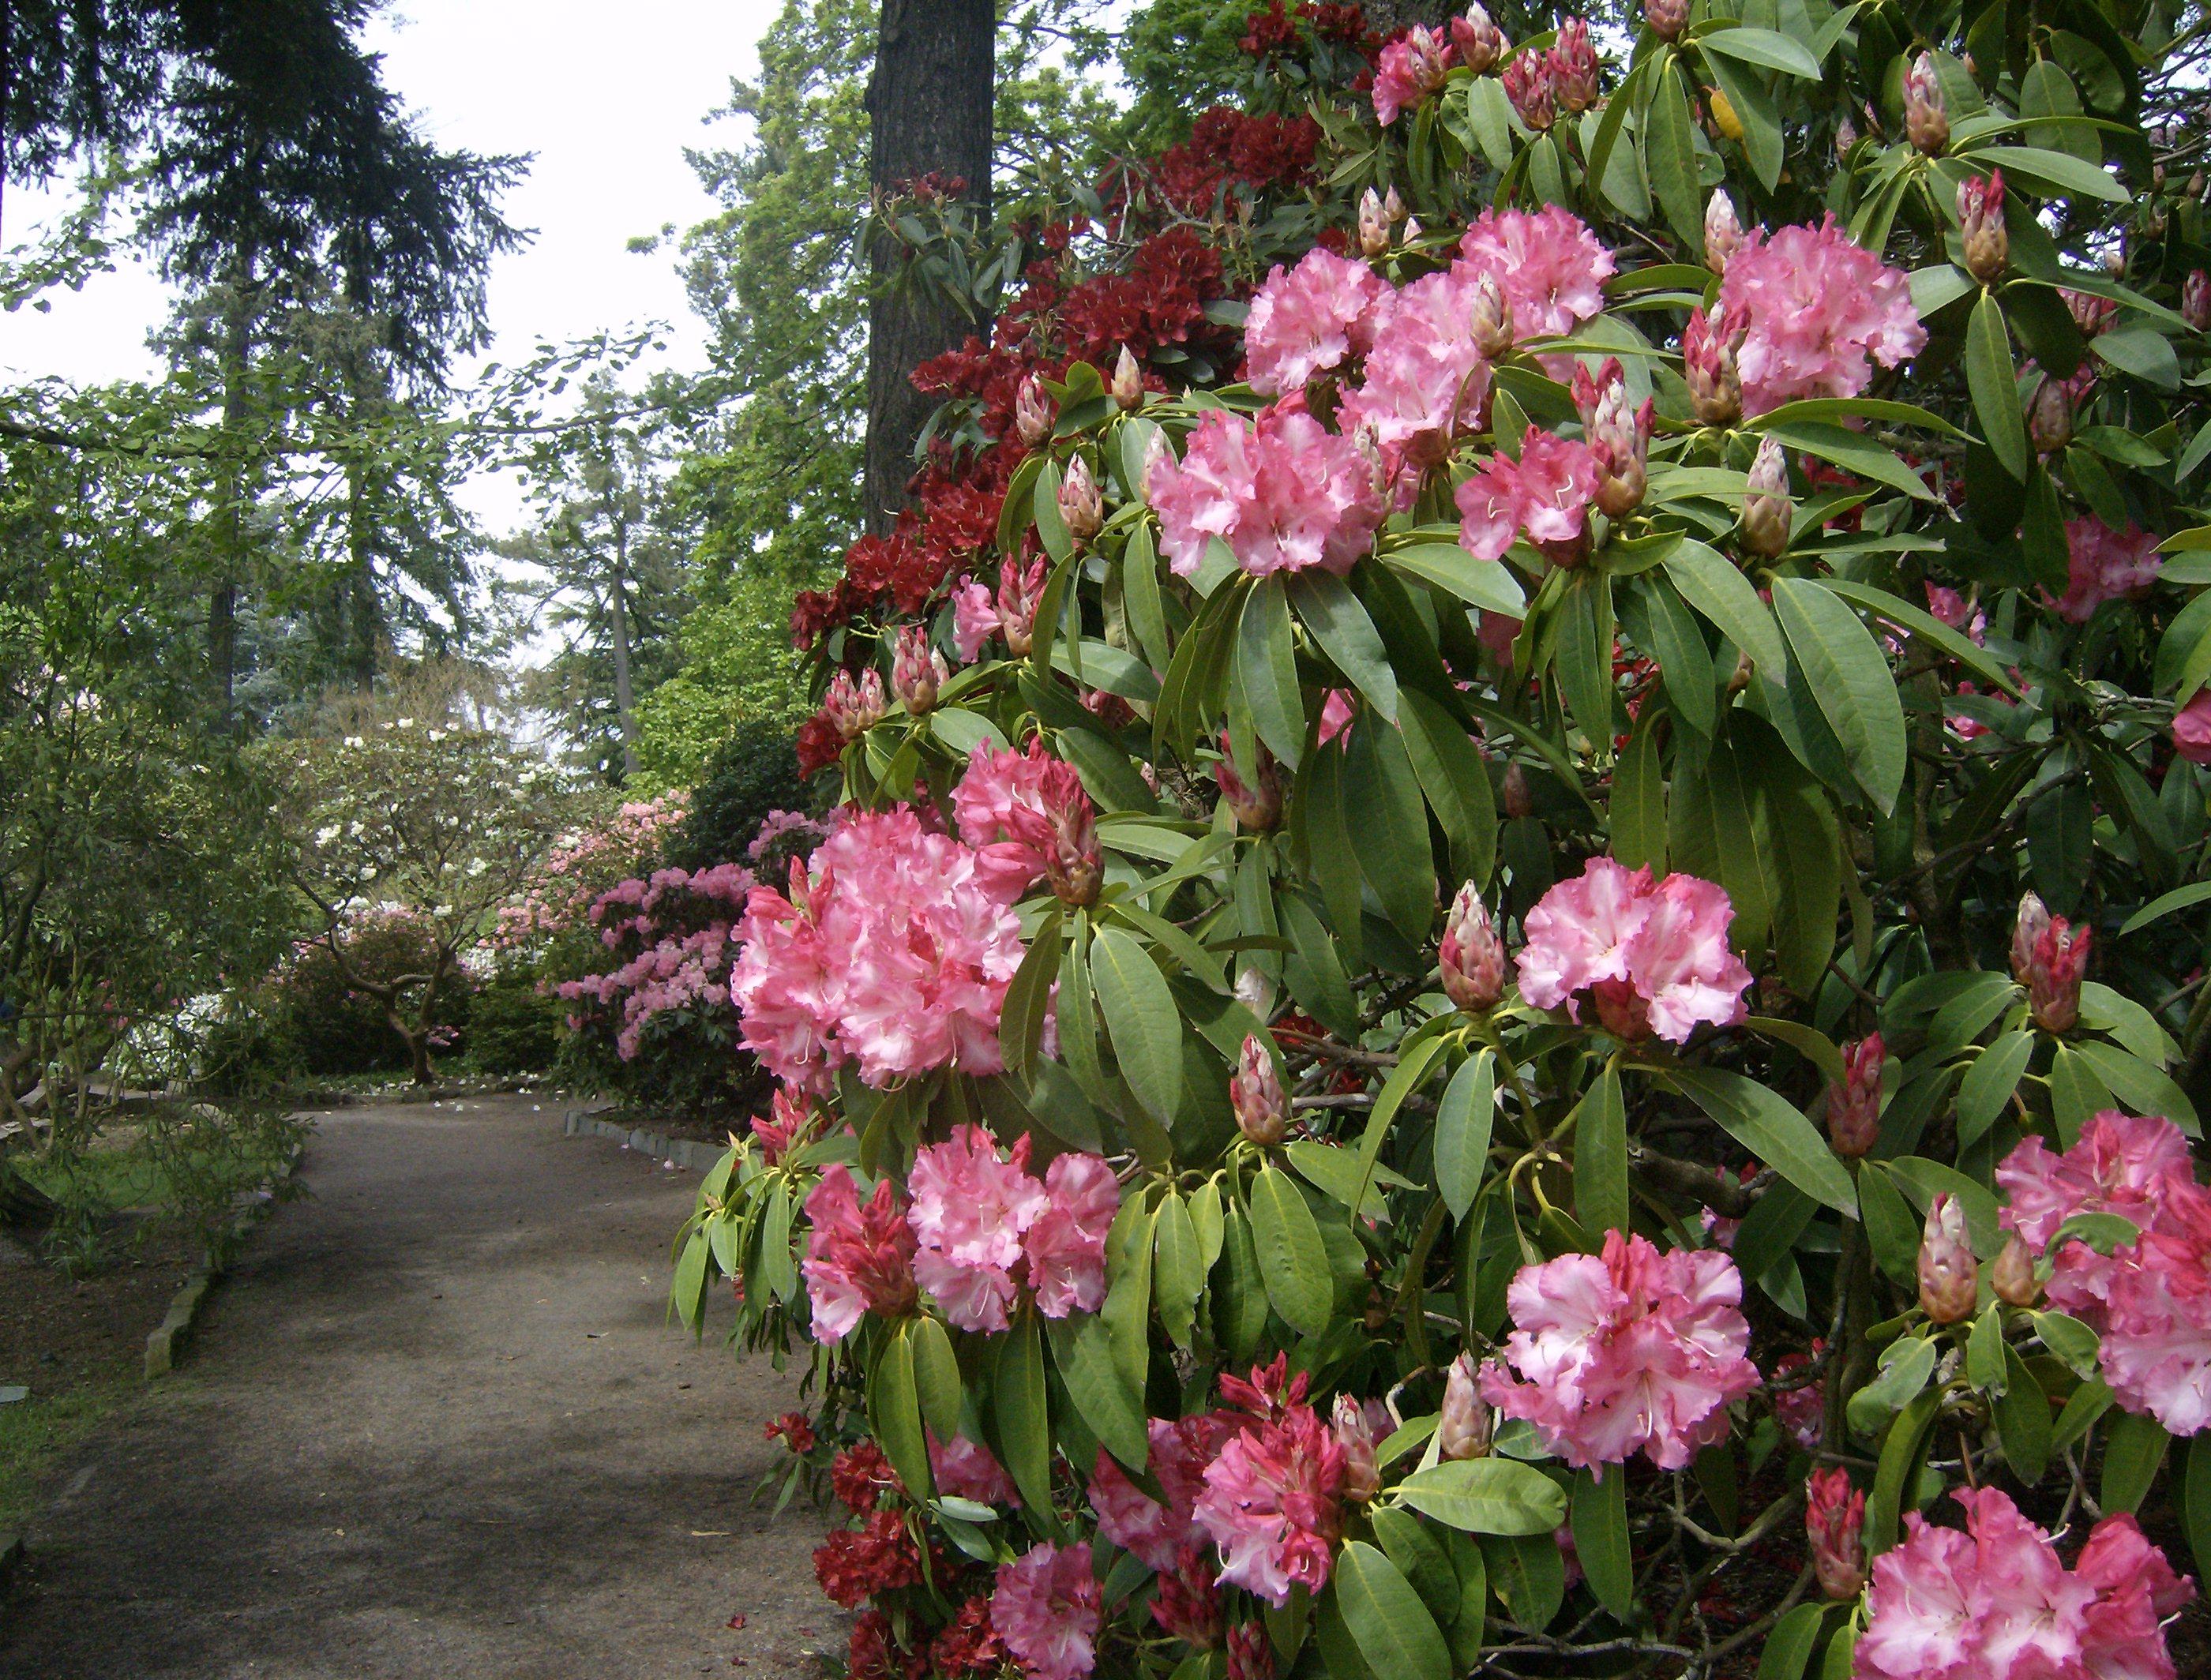 Crystal springs rhododendron garden steve snedeker s landscaping and gardening blog for Crystal springs rhododendron garden